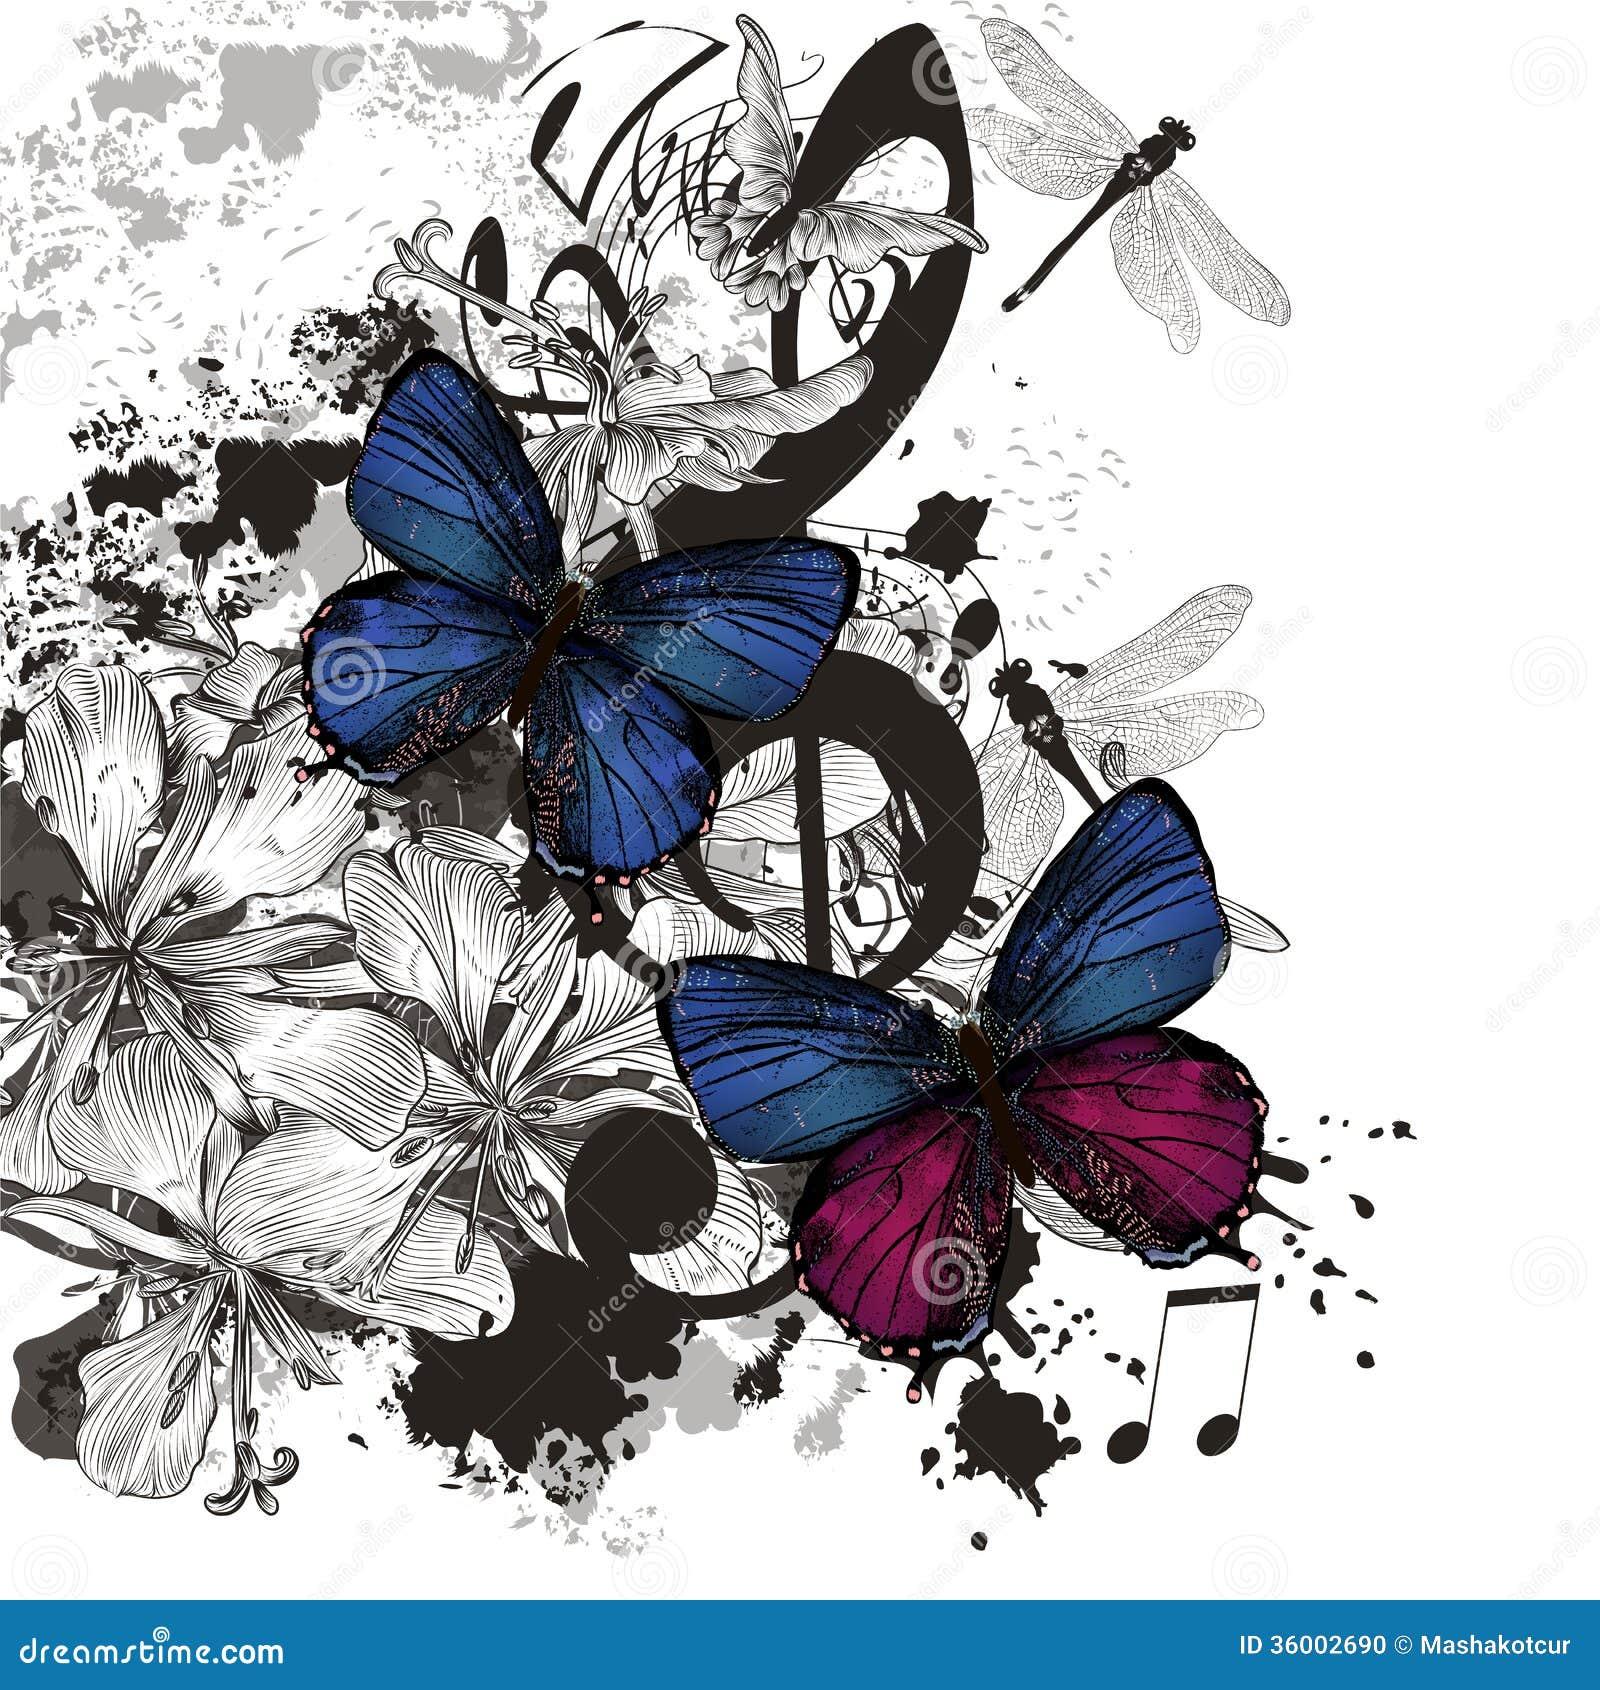 Artistic Futuristic Music Background With Grunge Elements Stock Photo - Image: 36002690